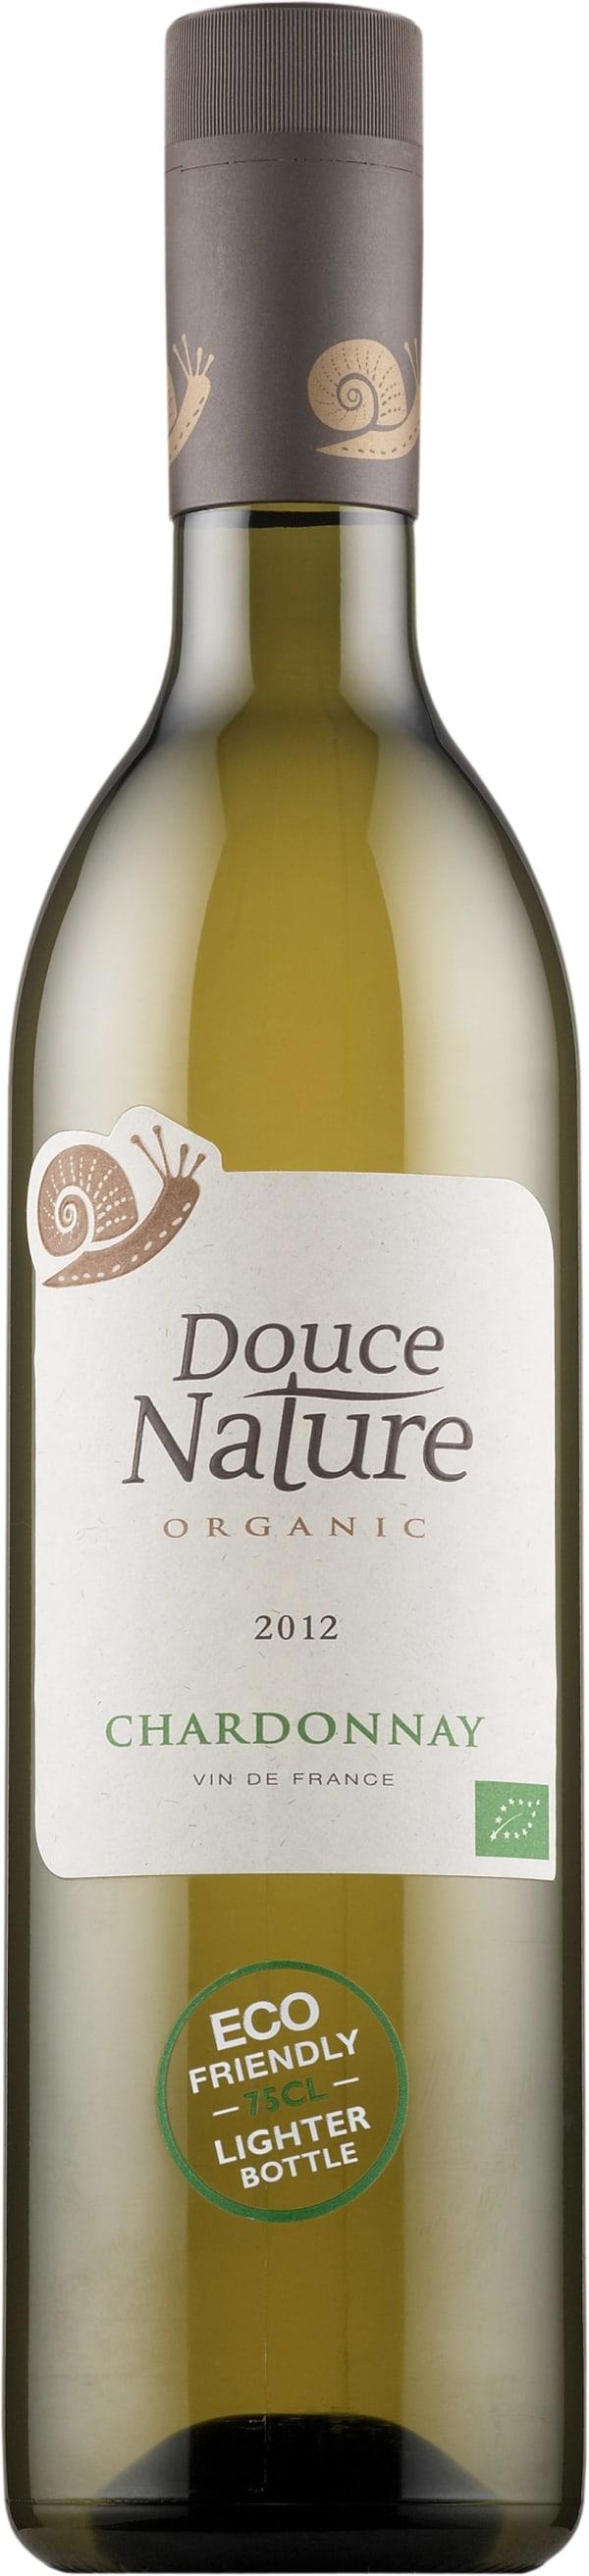 Douce Nature Organic Chardonnay 2015 muovipullo